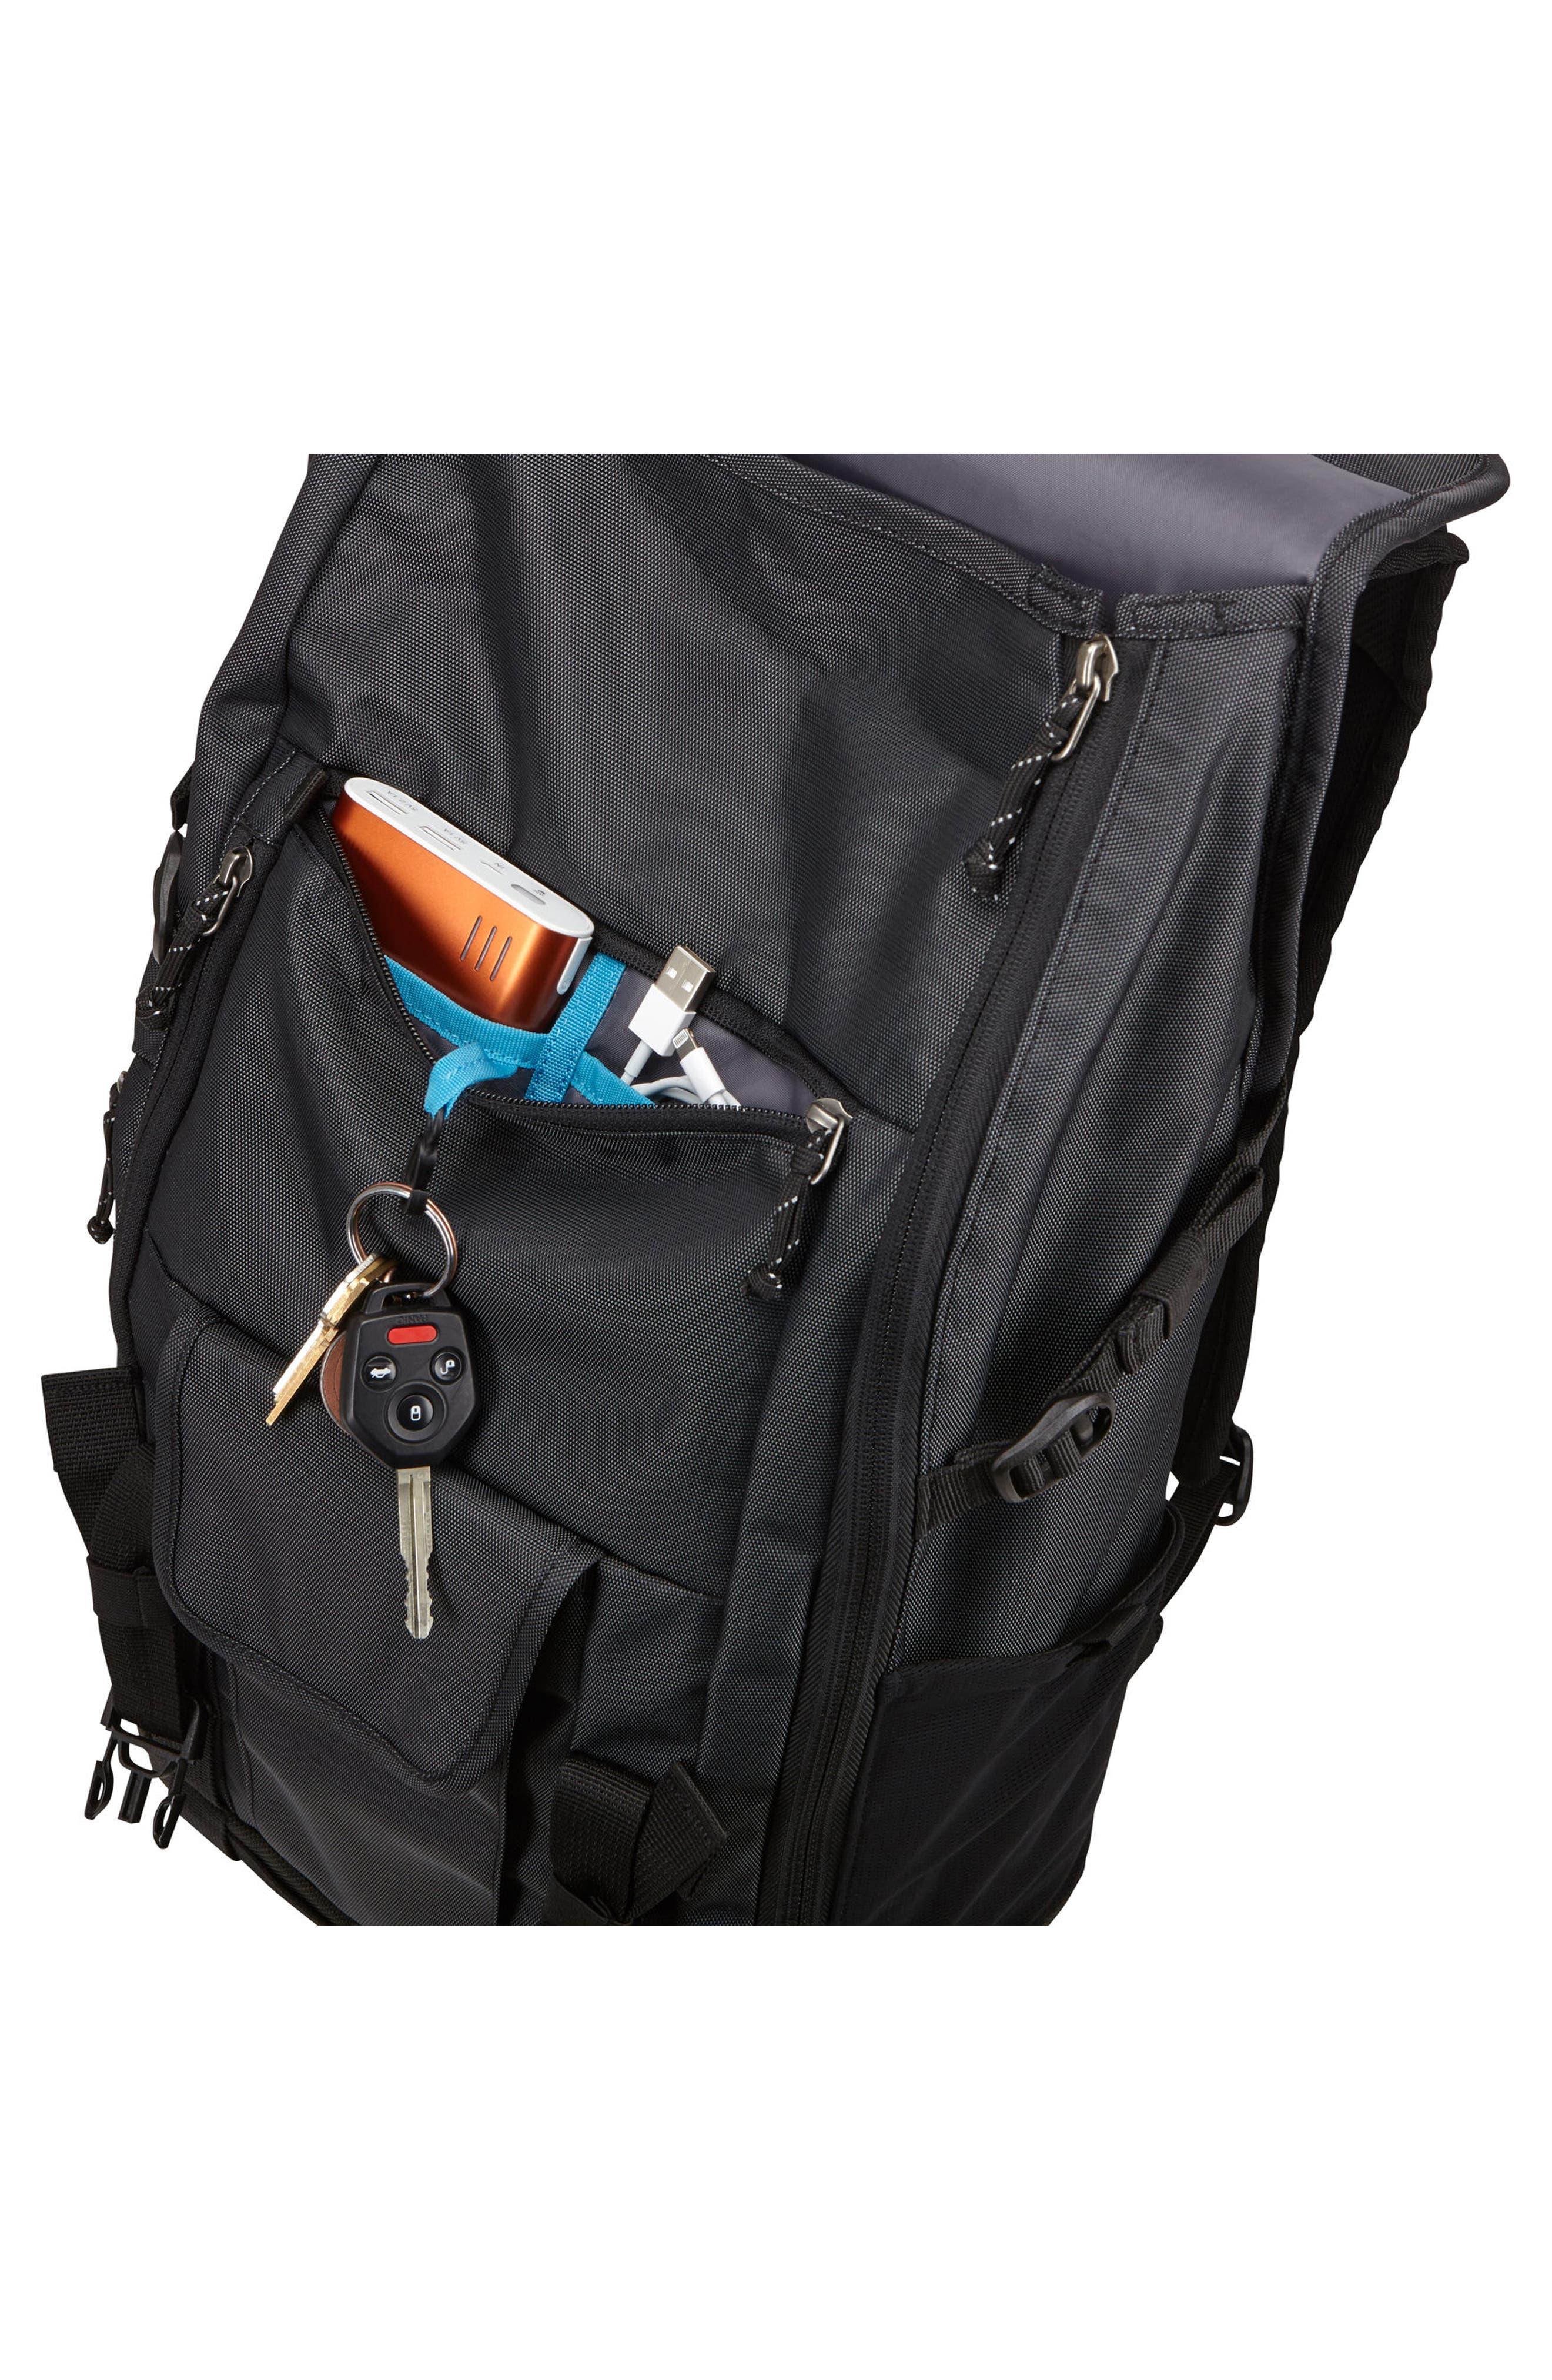 Subterra 34-Liter Backpack,                             Alternate thumbnail 14, color,                             Dark Shadow